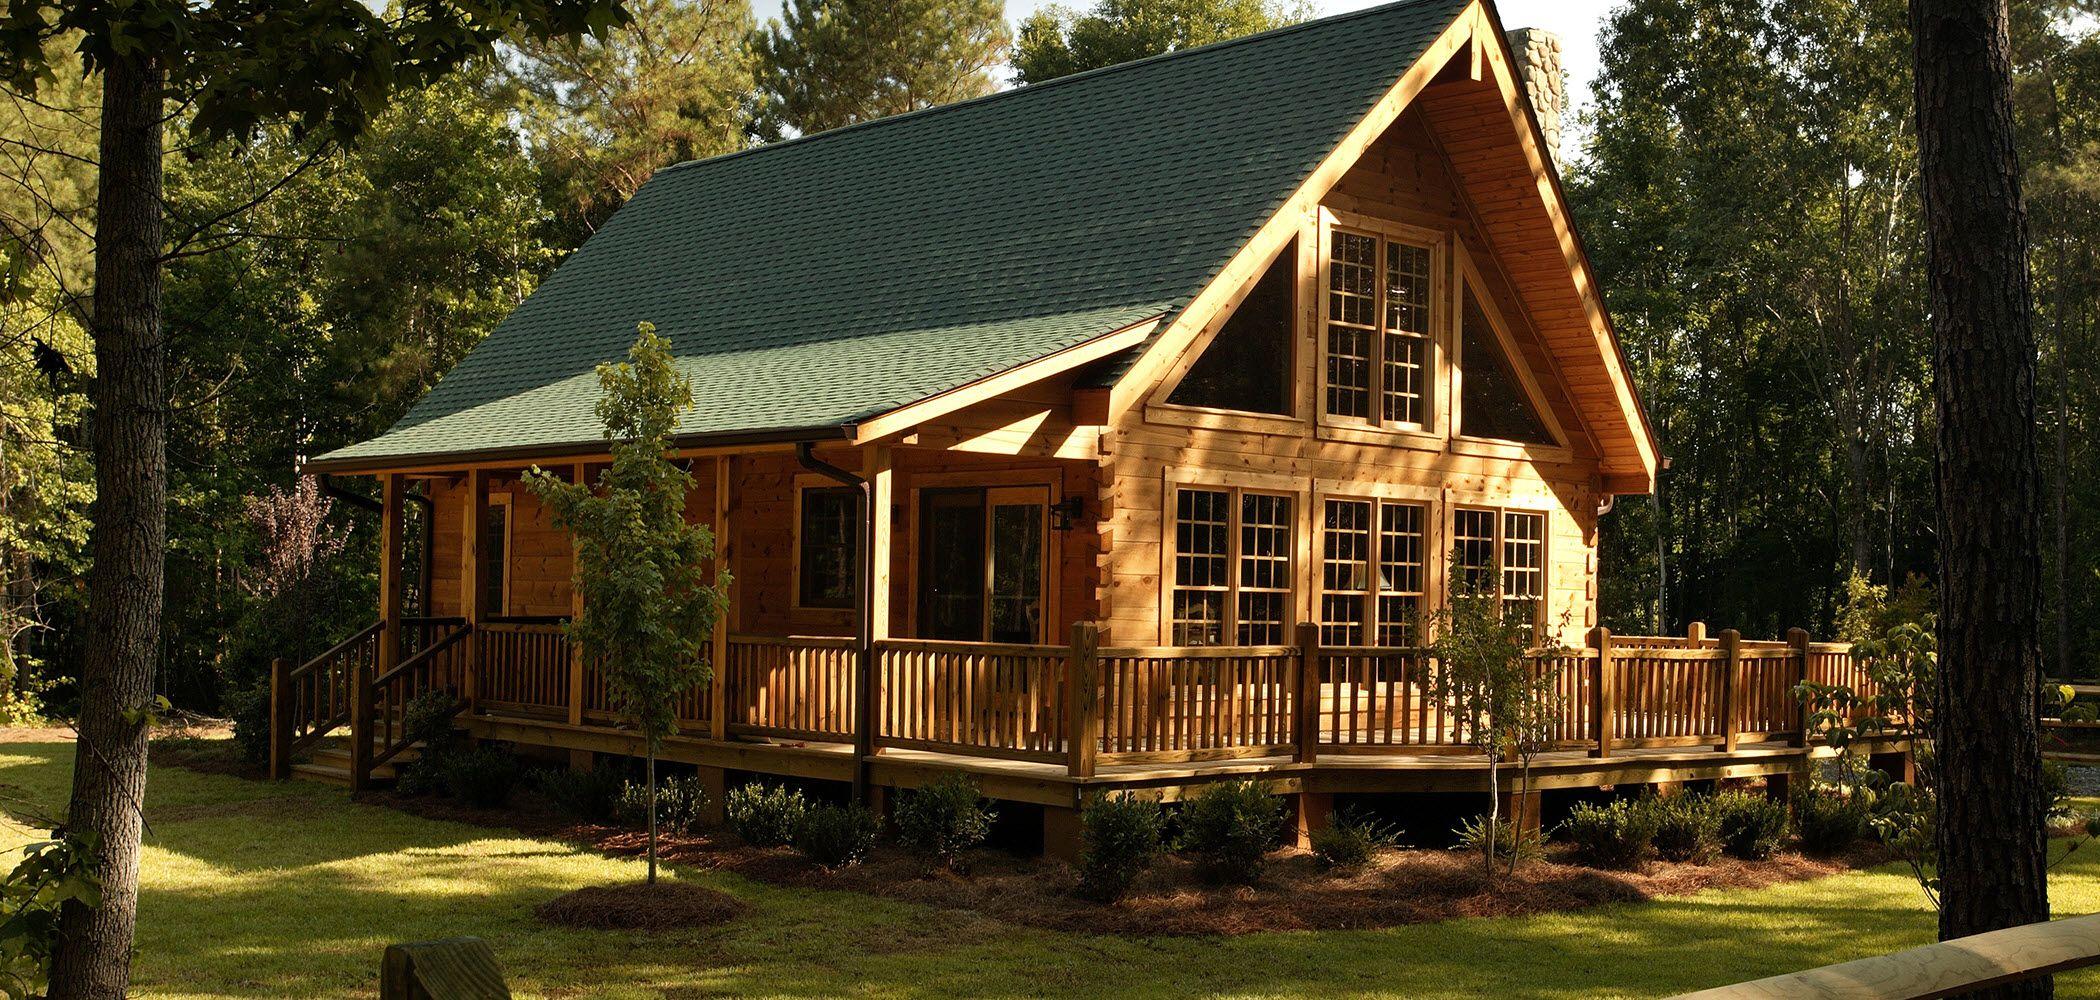 Log cabins for sale in north carolina - Log Cabin House Plans Rockbridge Log Home Cabin Plans Back Deck And Place For Upper Deck Potential House Plans Pinterest Log Cabin House Plans